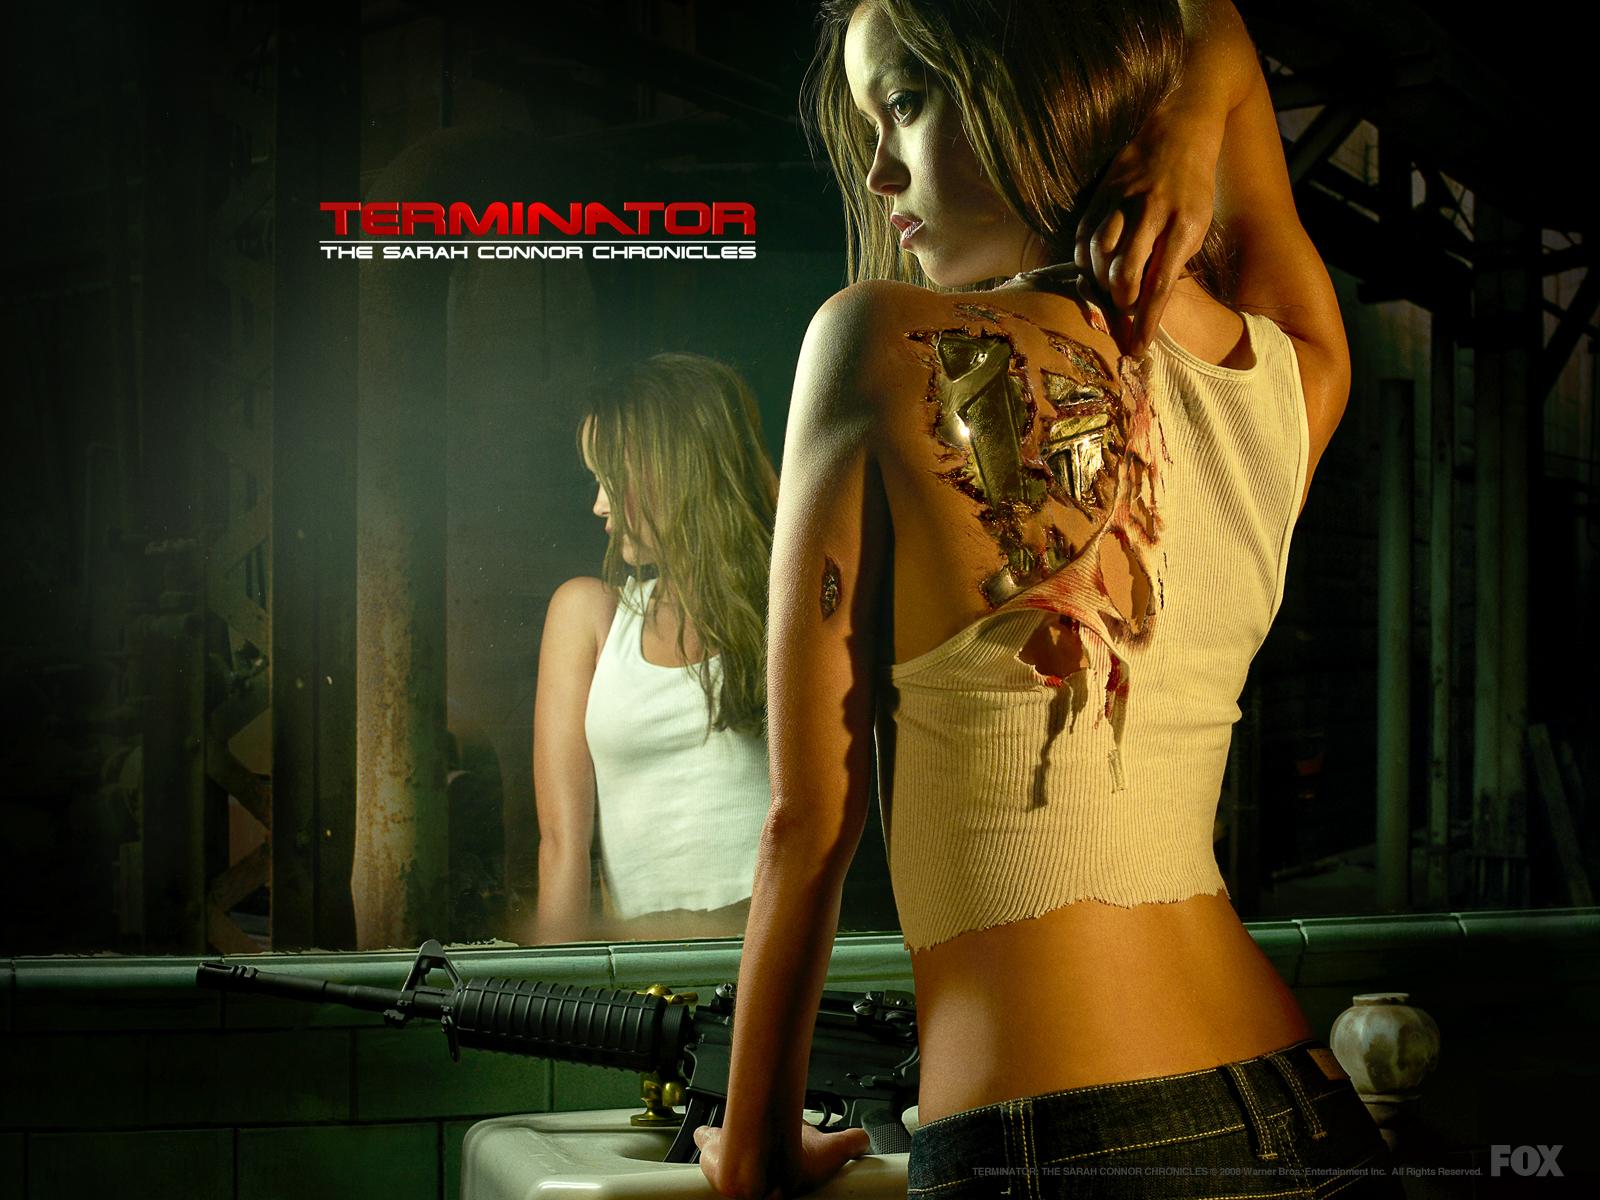 http://4.bp.blogspot.com/-WOWcVV80z6Y/TV0dEyq7eeI/AAAAAAAABZ4/gaCxJTaJ3Ok/s1600/1600x1200_wallpaper_1.jpg